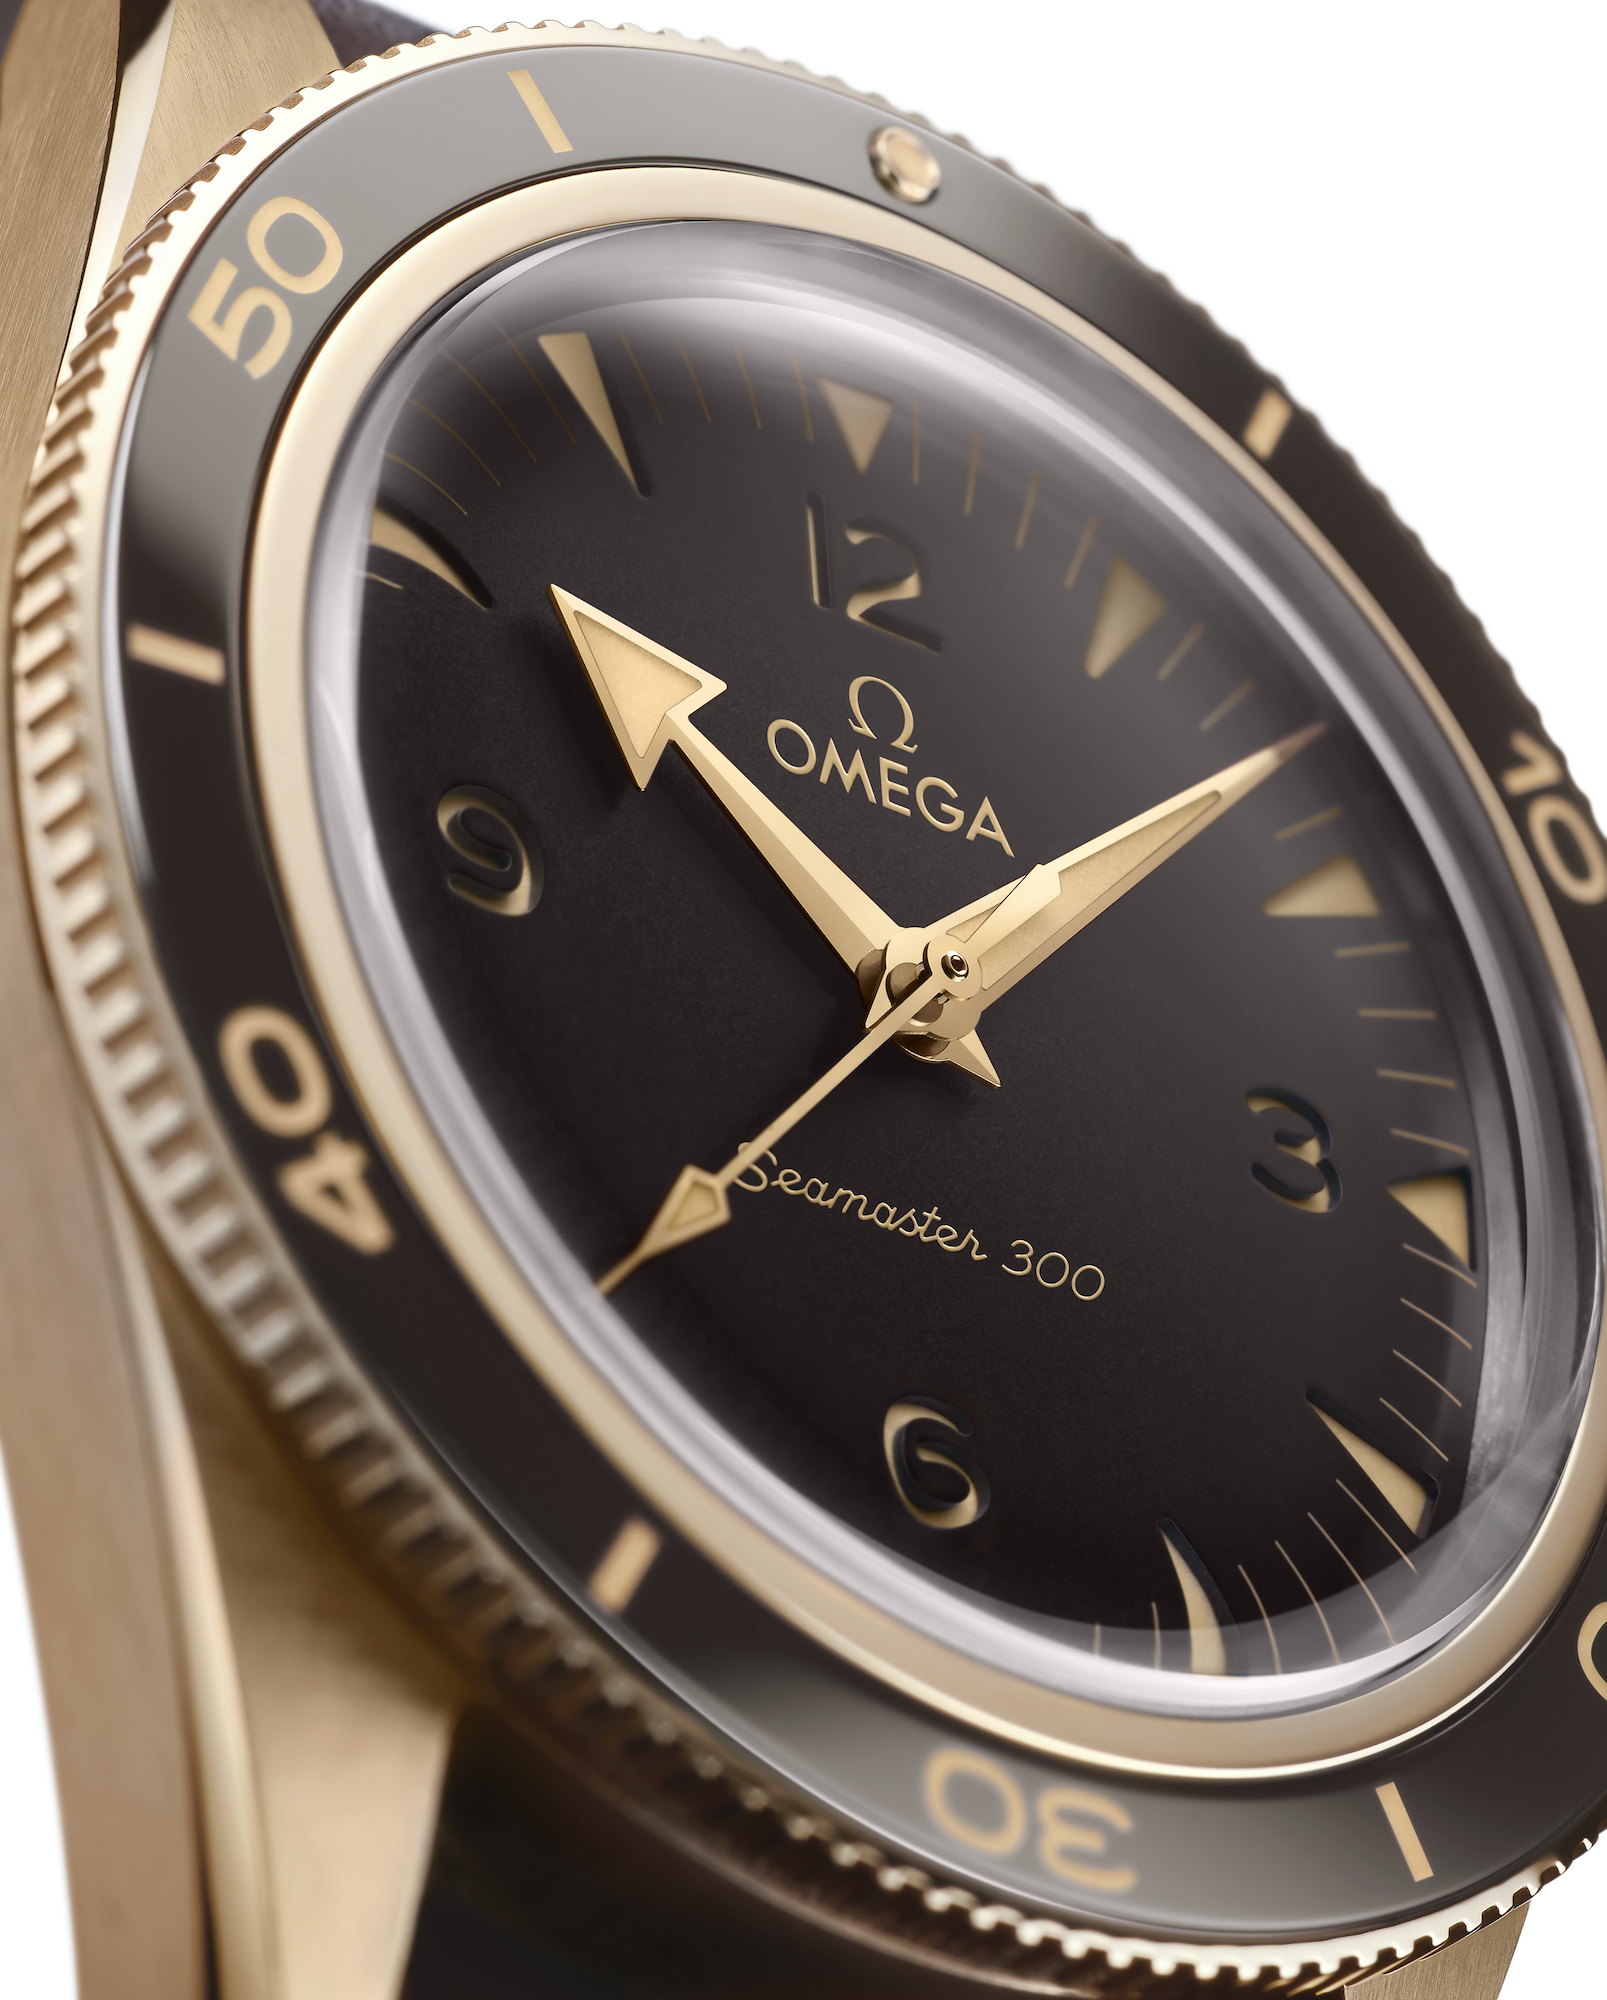 Omega Seamaster 300 234.92.41.21.10.001 detalle esfera